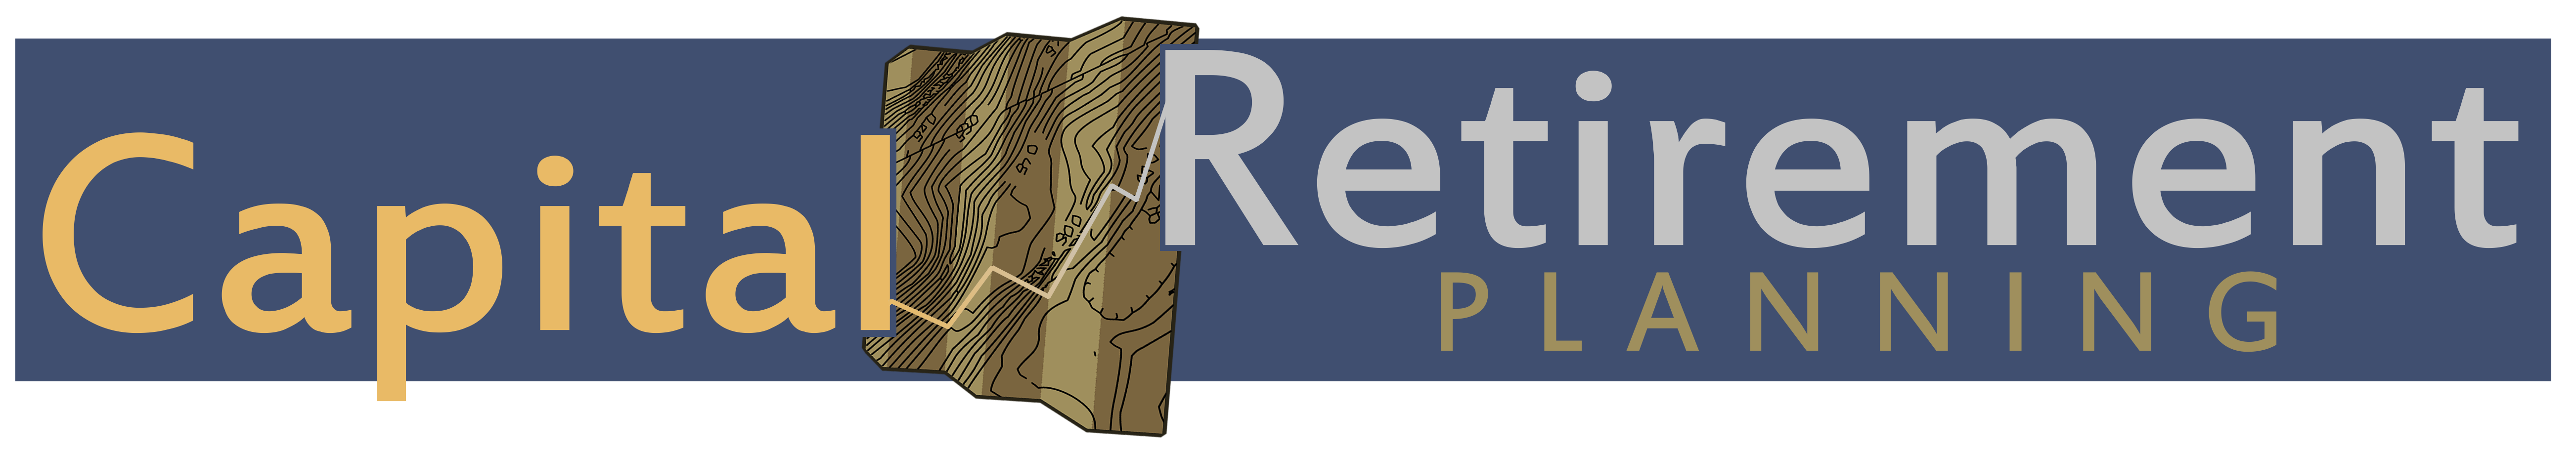 Capital Retirement Planning Logo